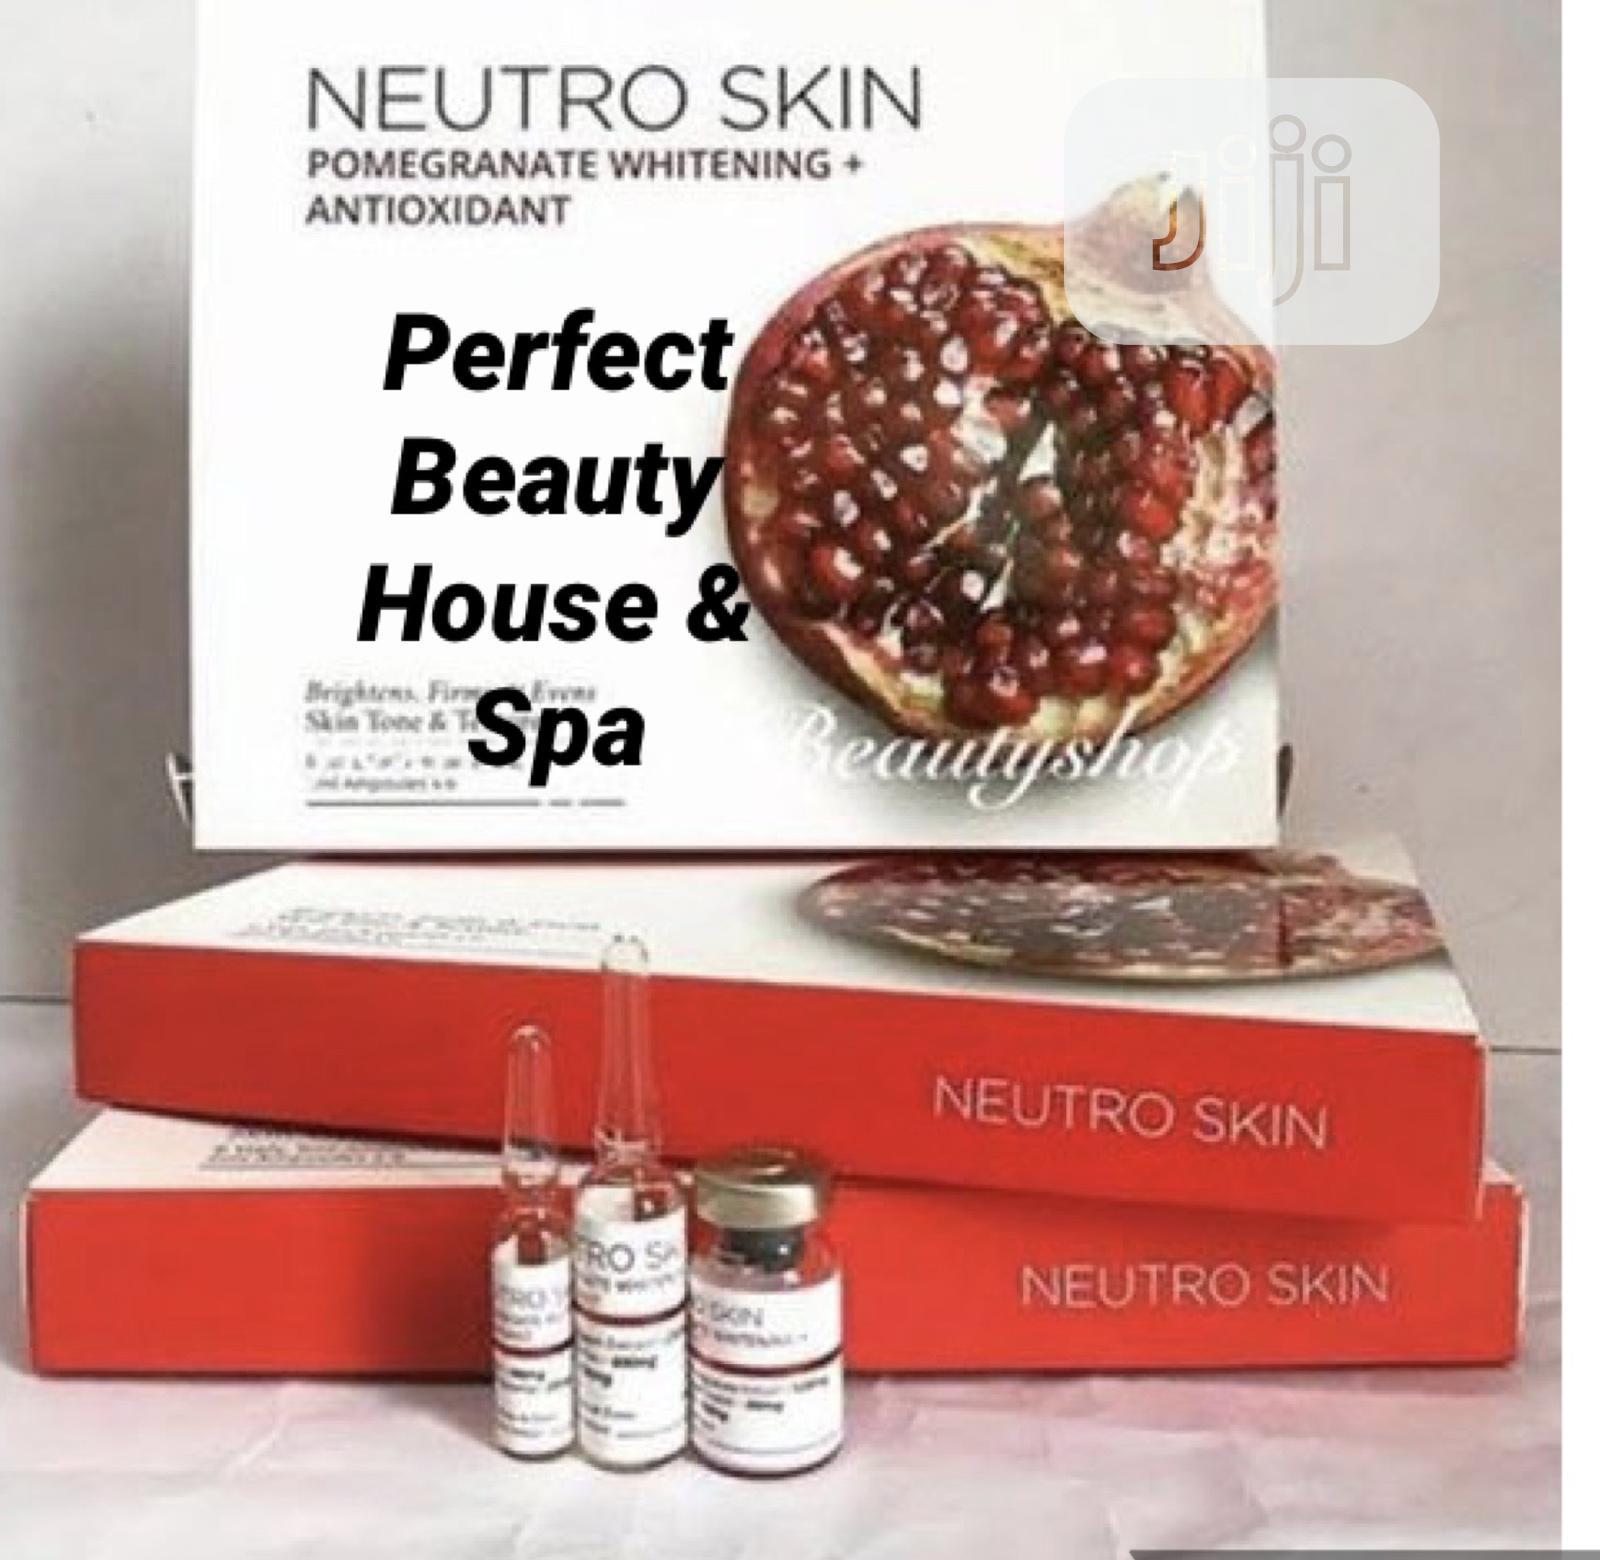 Neutro Skin Pomegranate Whitening Antioxidant IV